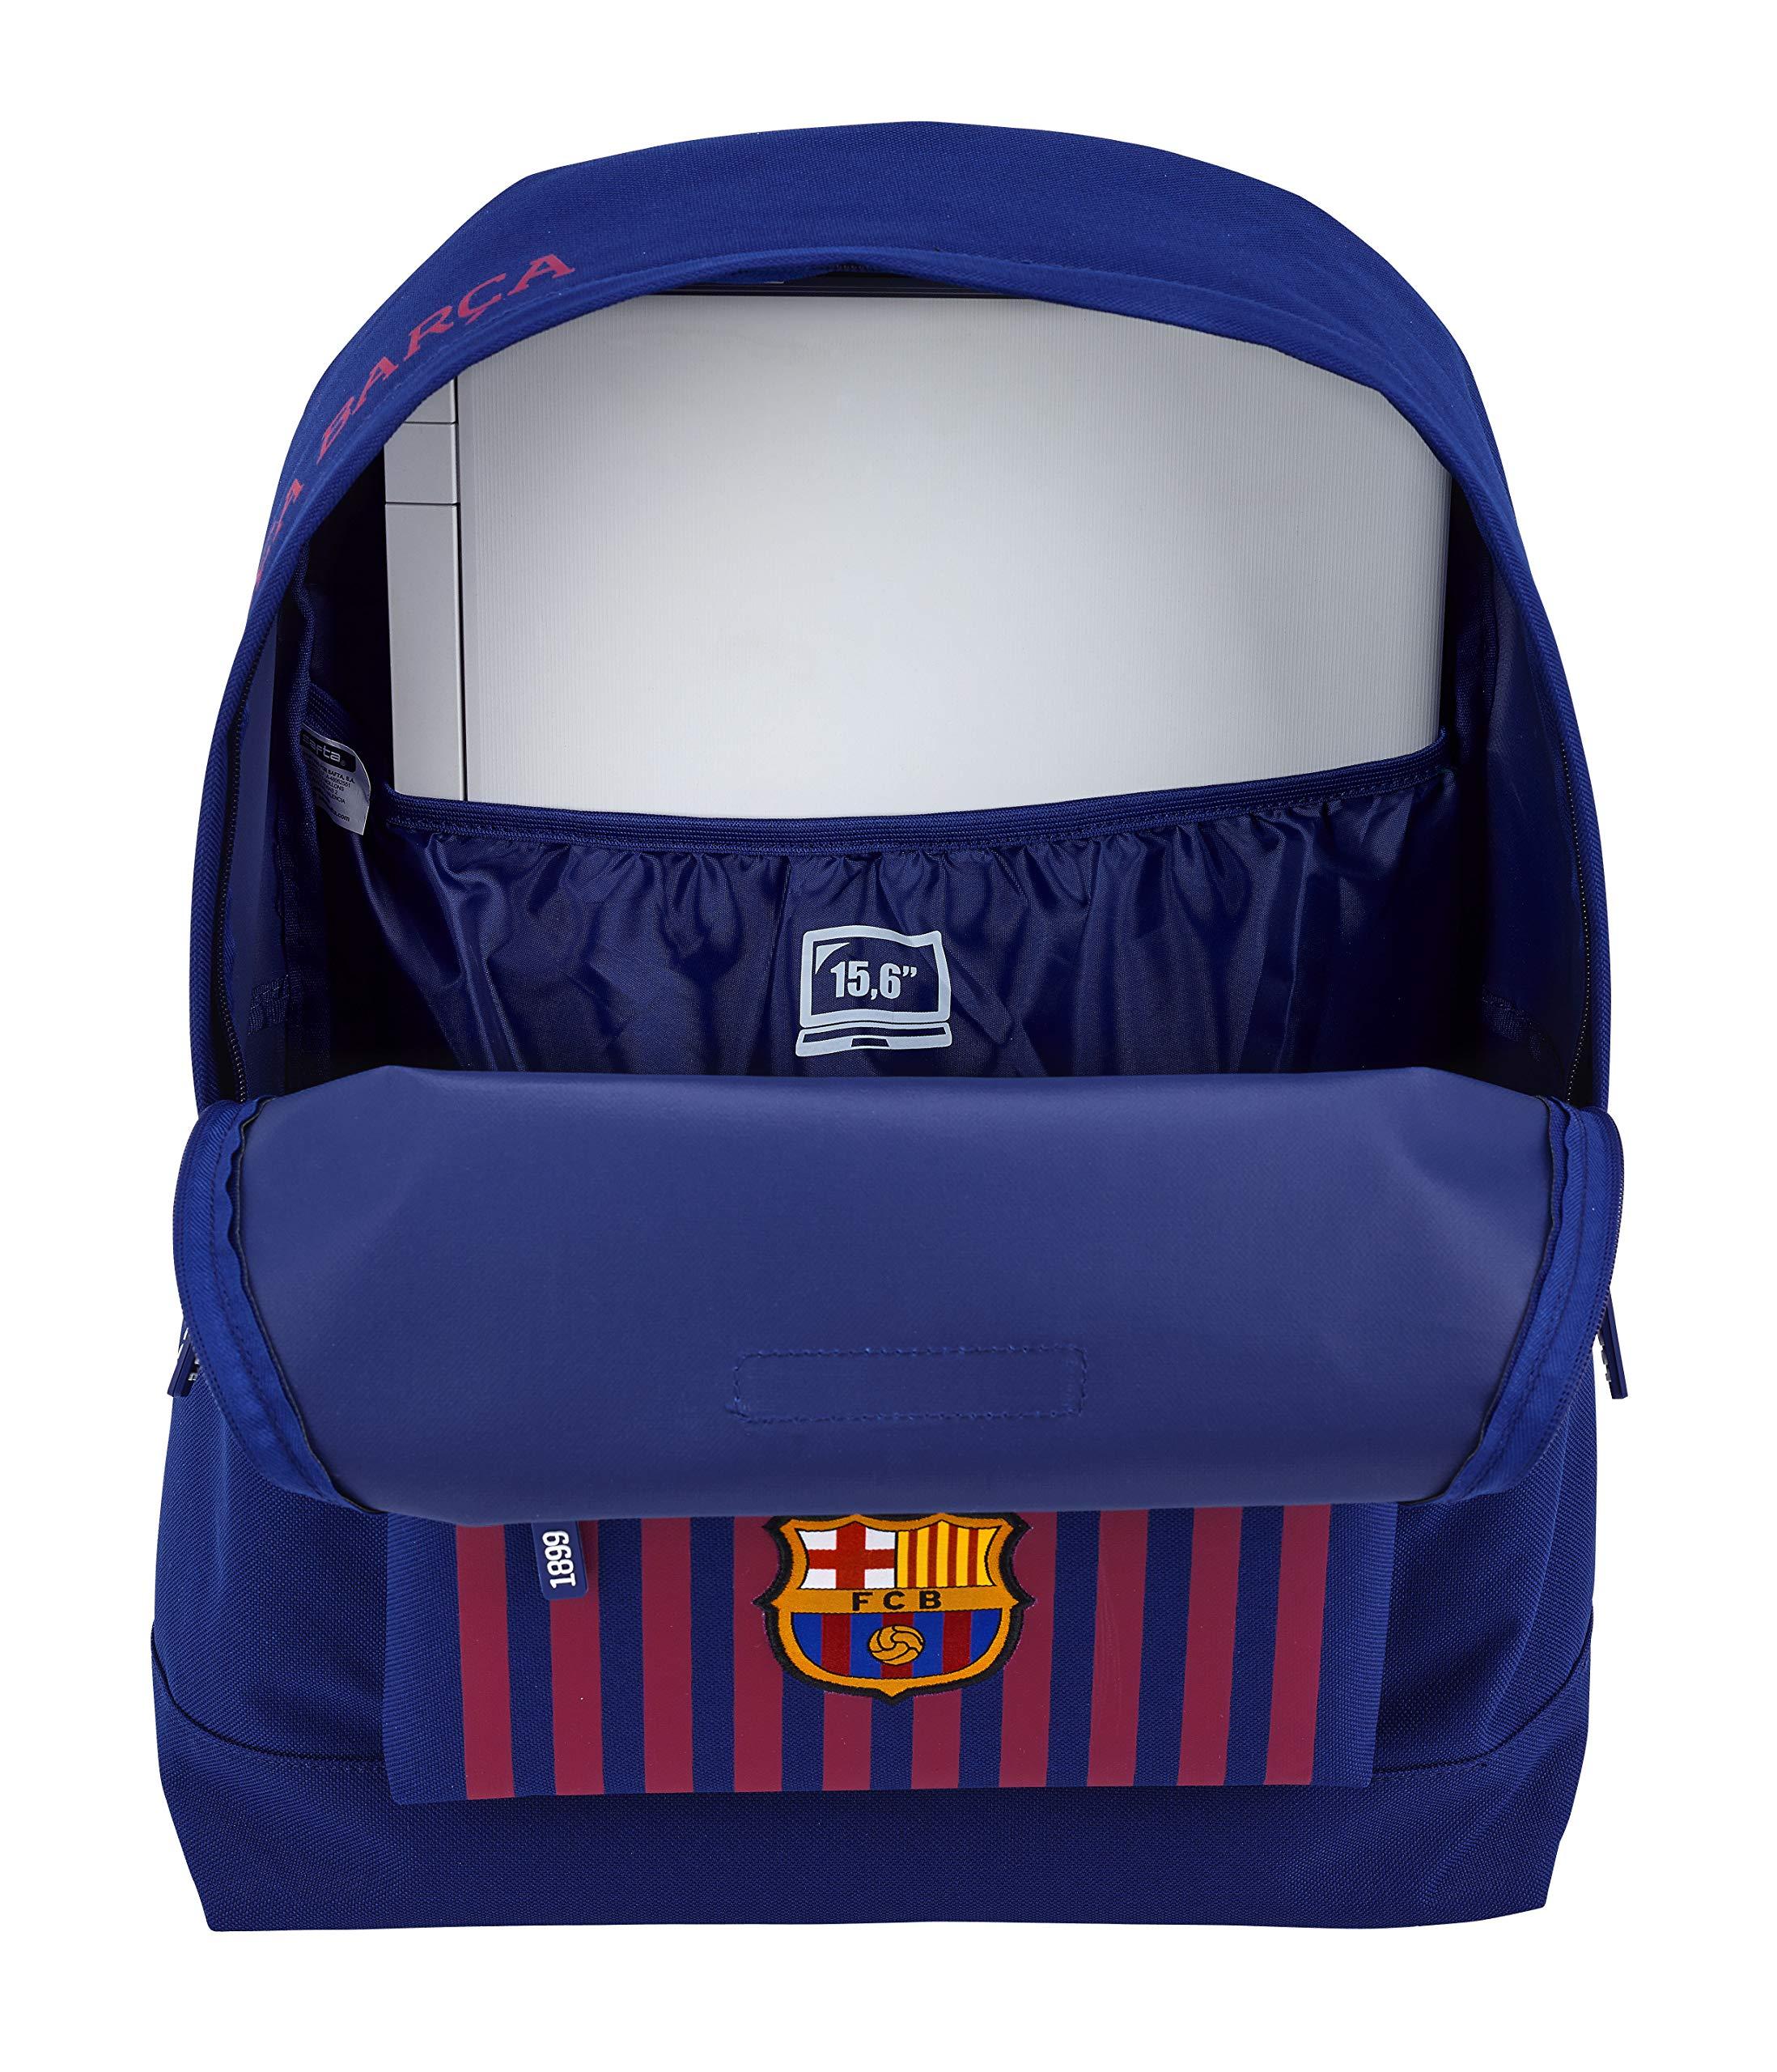 91SG1uLVAVL - FC Barcelona Mochila Grande con Funda Ordenador.